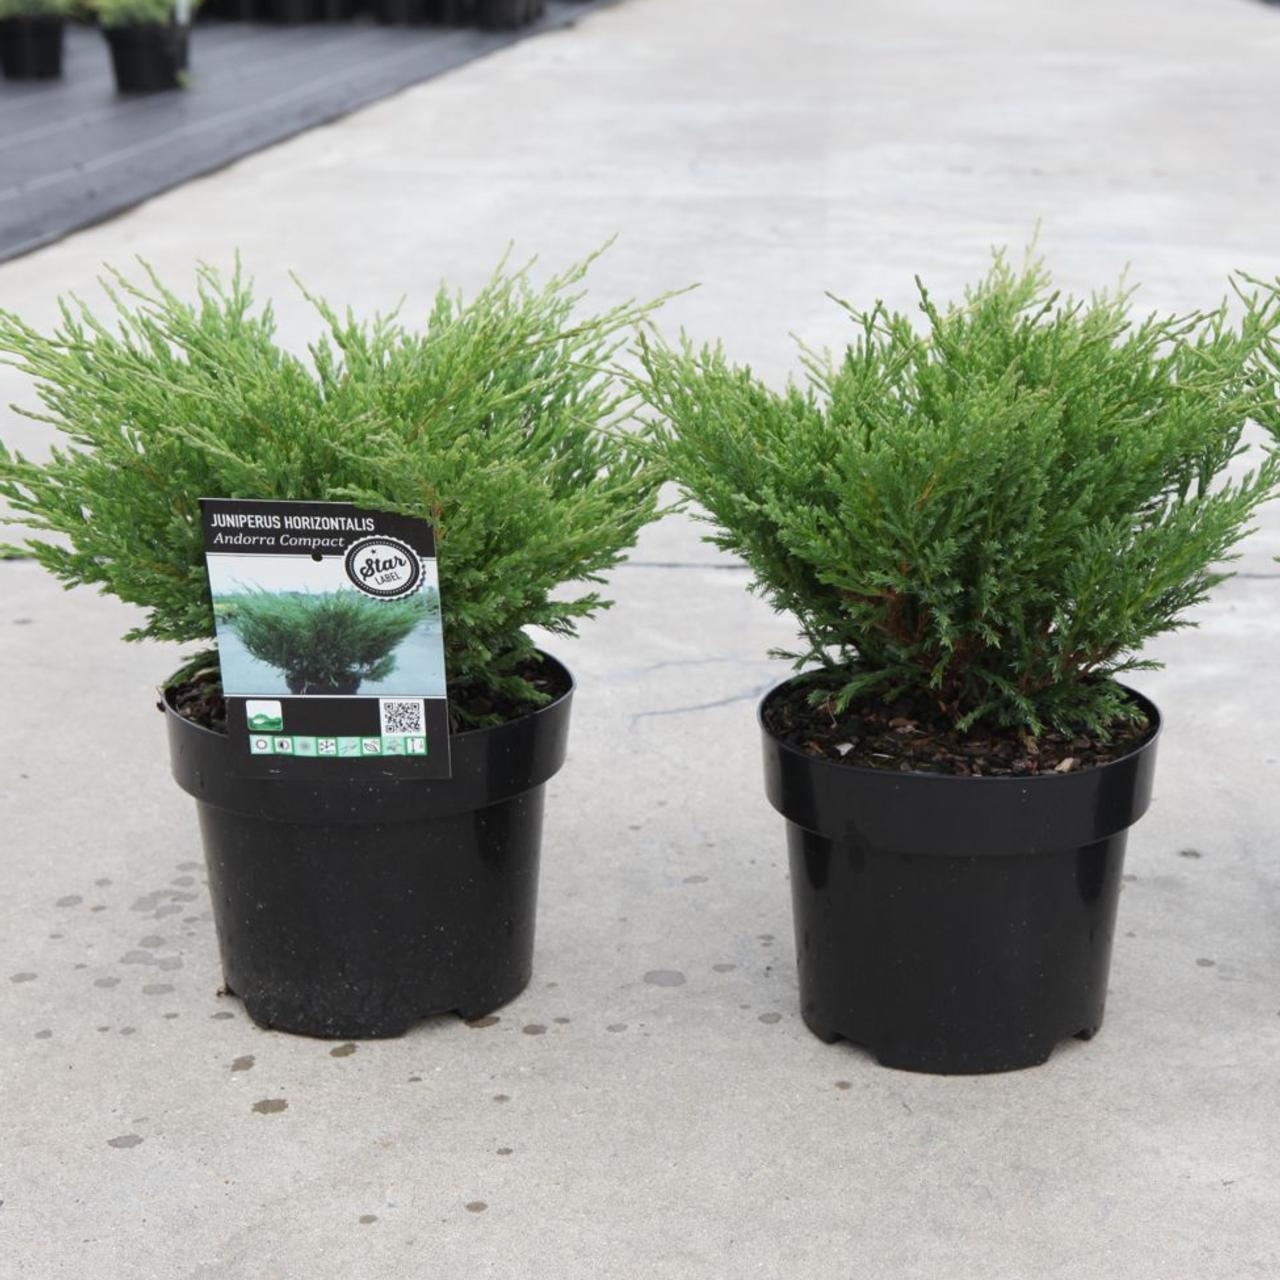 Juniperus horizontalis 'Andorra Compact' plant